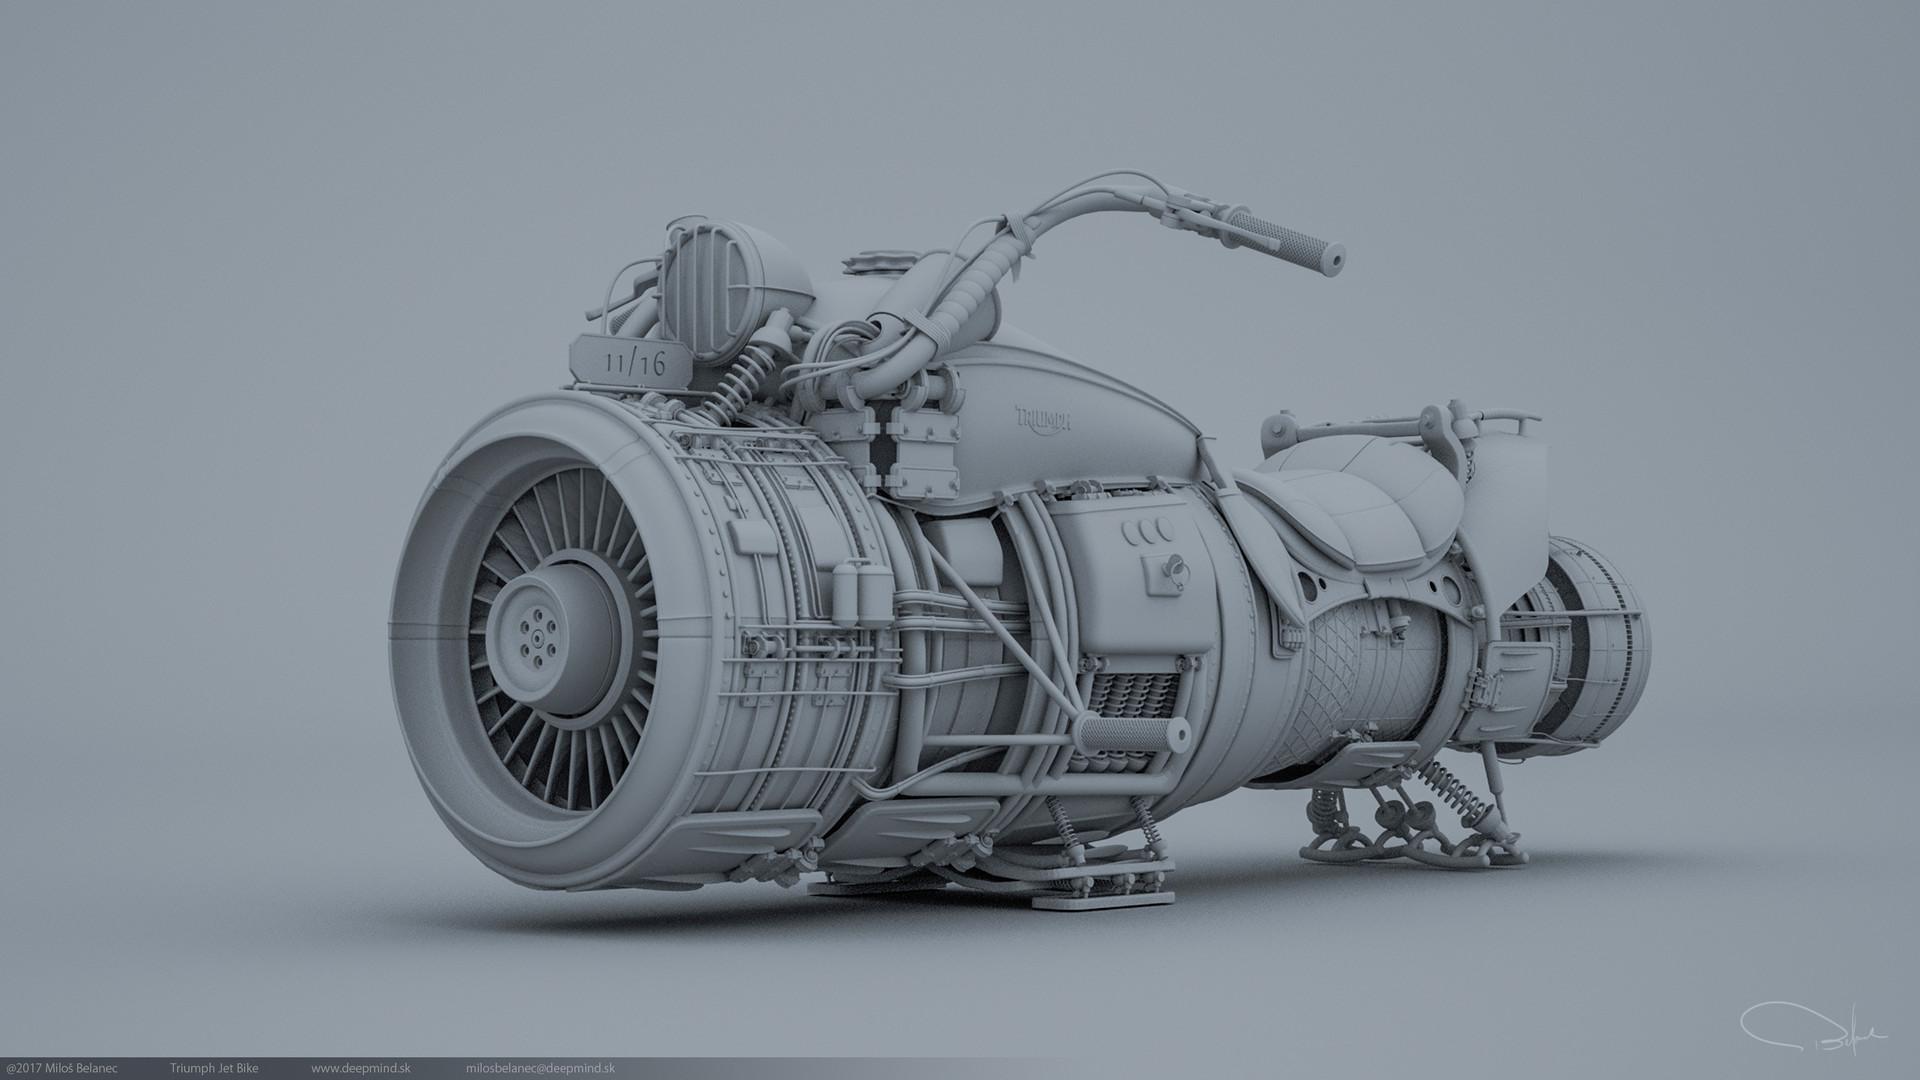 milos-belanec-jet-bike-wip-concpt-2016-c